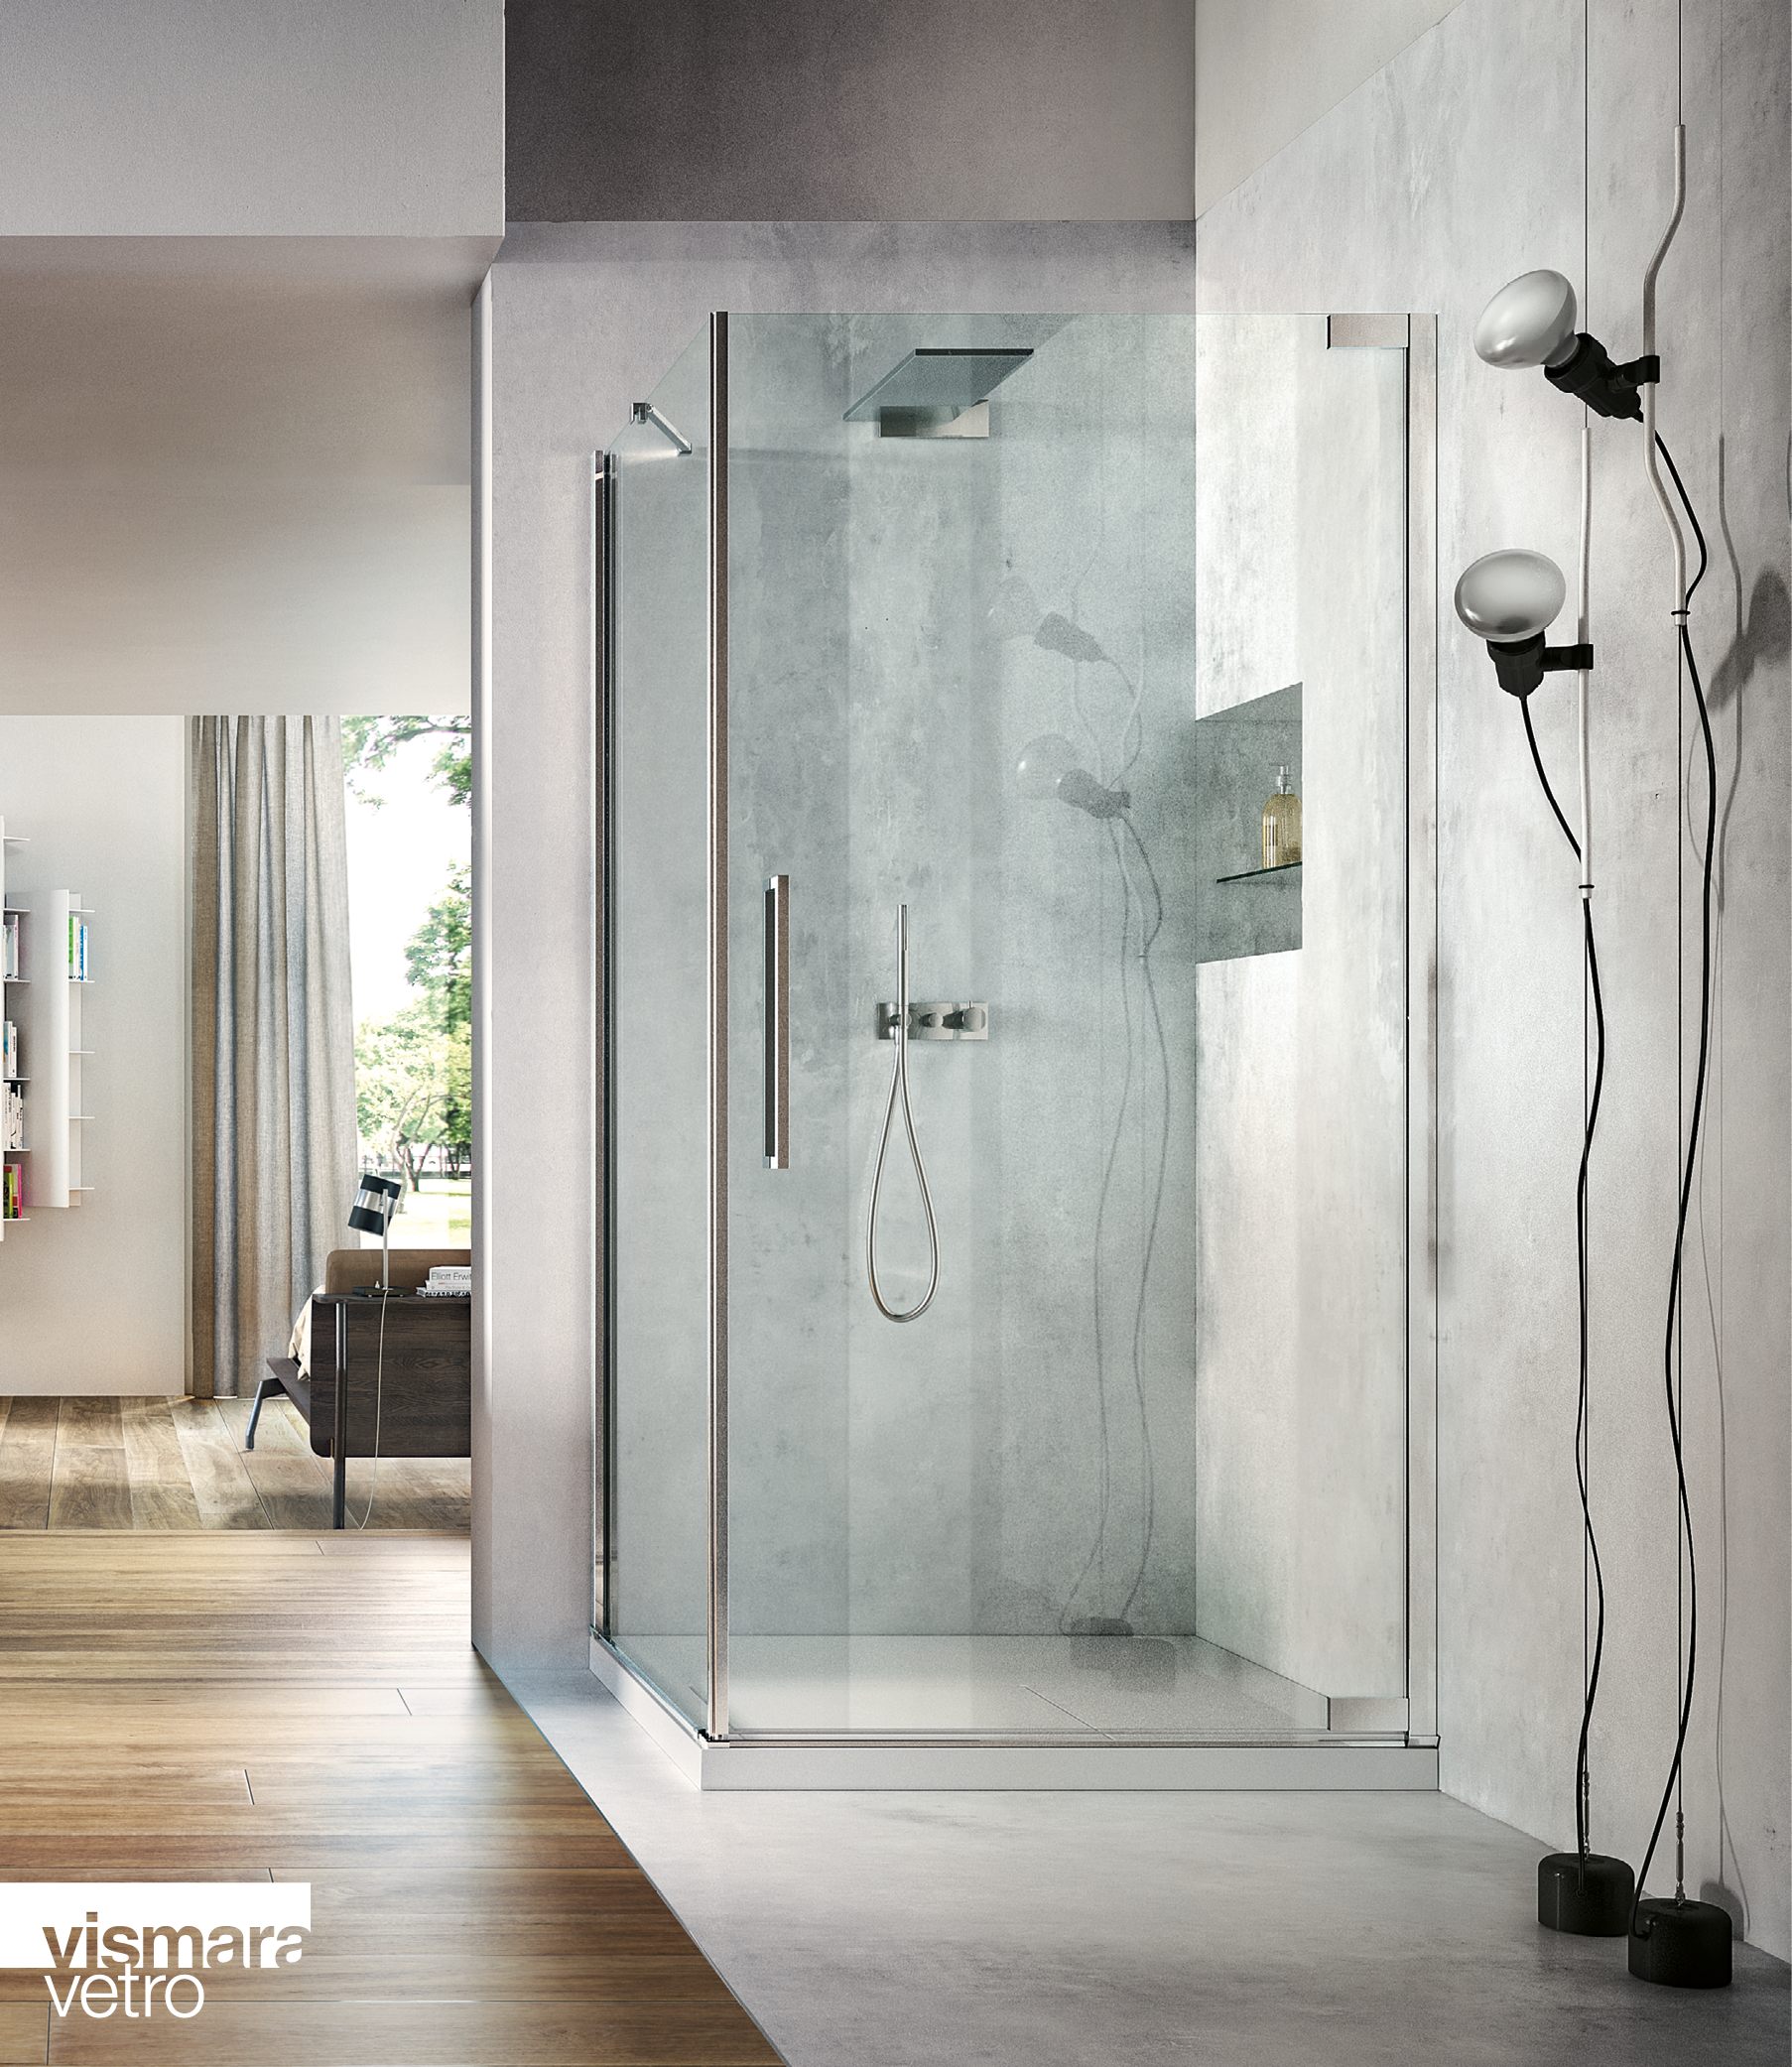 Flare By Vismaravetro The Pivot Door Shower Enclosure In 2020 Shower Enclosure Pivot Doors Shower